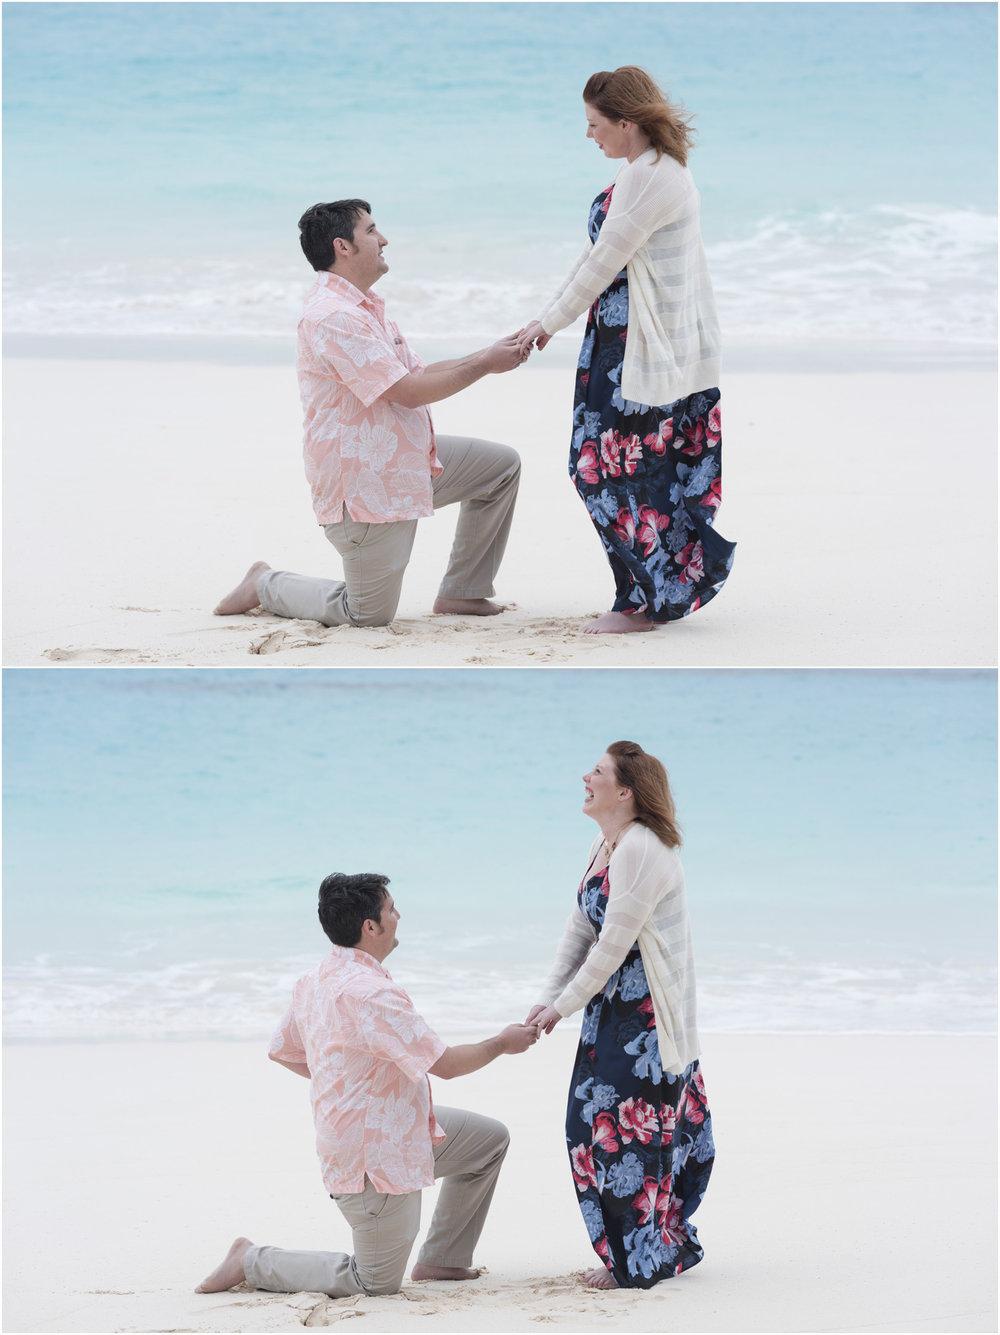 ©FianderFoto_Engagement_1.jpg